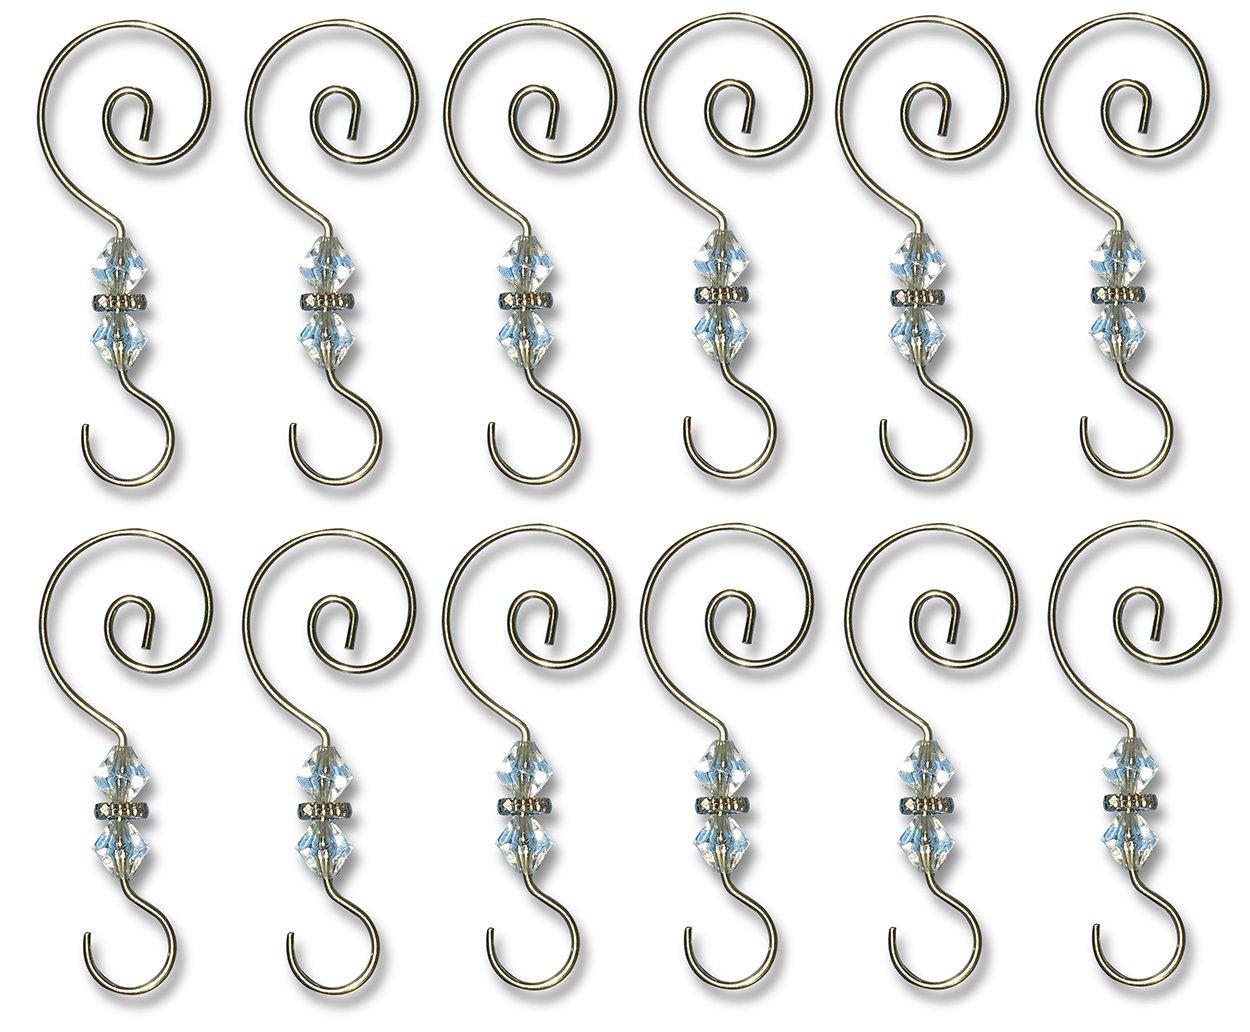 Heavy duty ornament hooks - Amazon Com Ornament Hooks 12 Pack Decorative Christmas Tree Ornament Hangers Home Kitchen